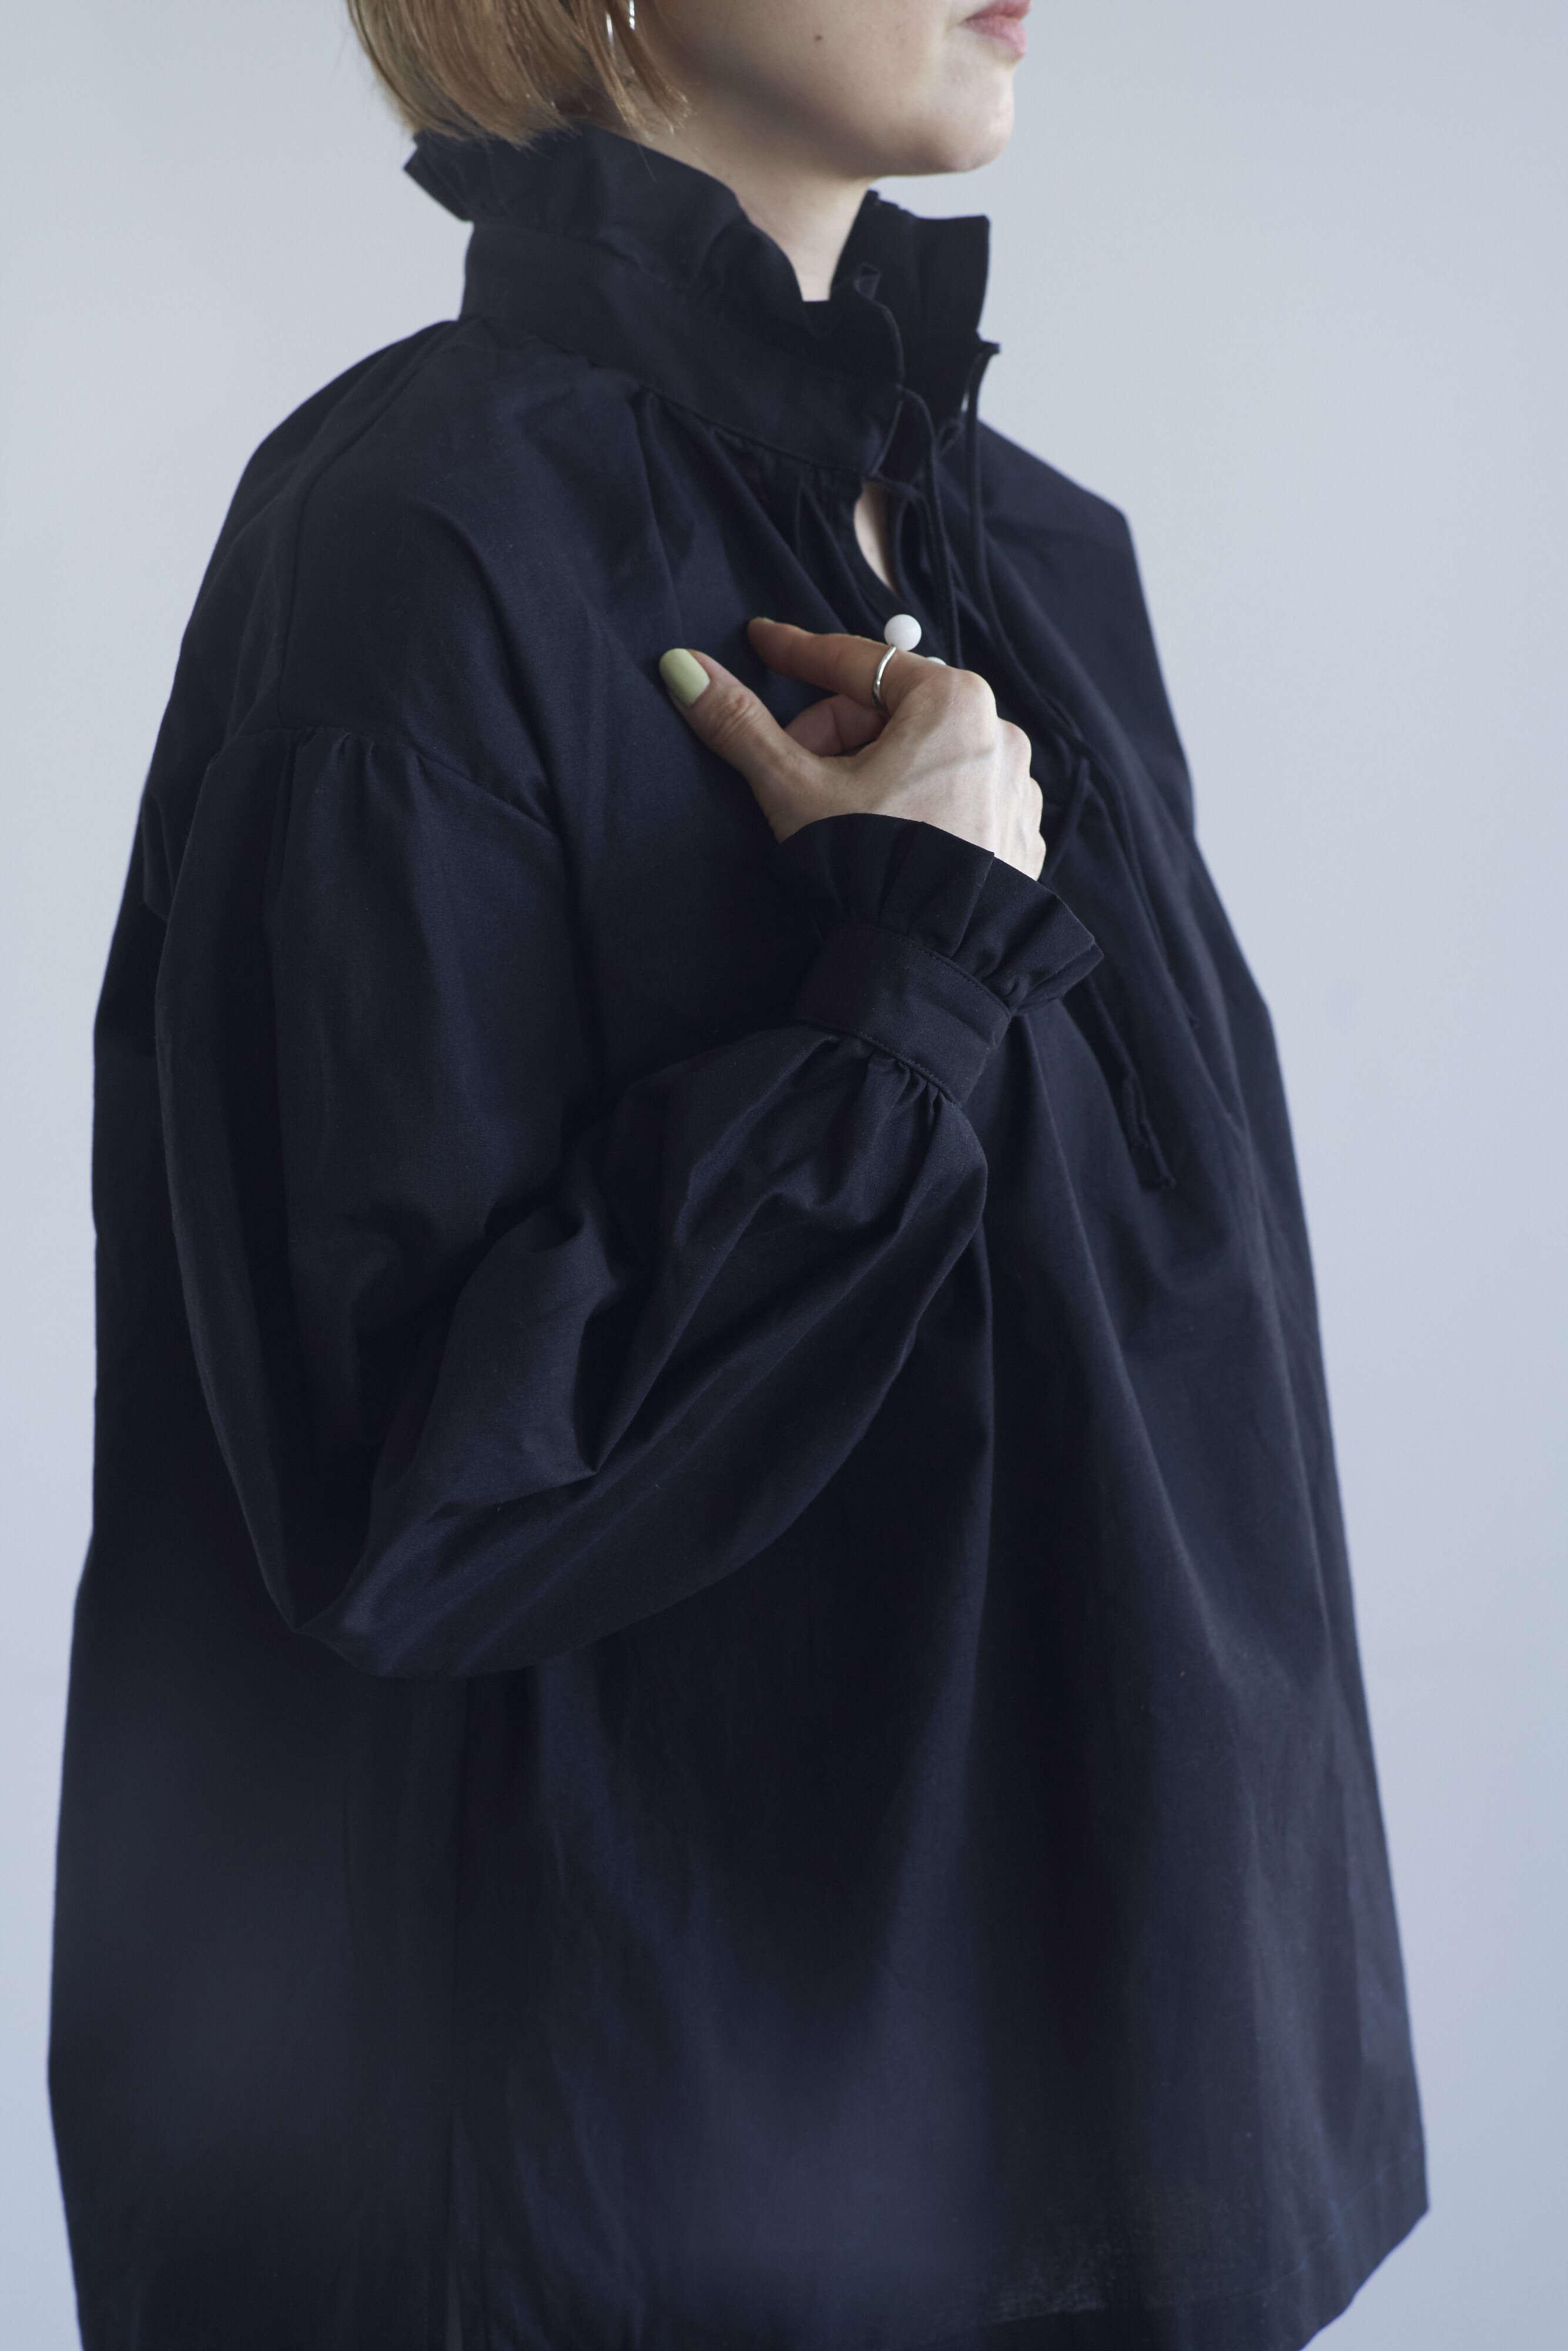 Duchess Designs blouse